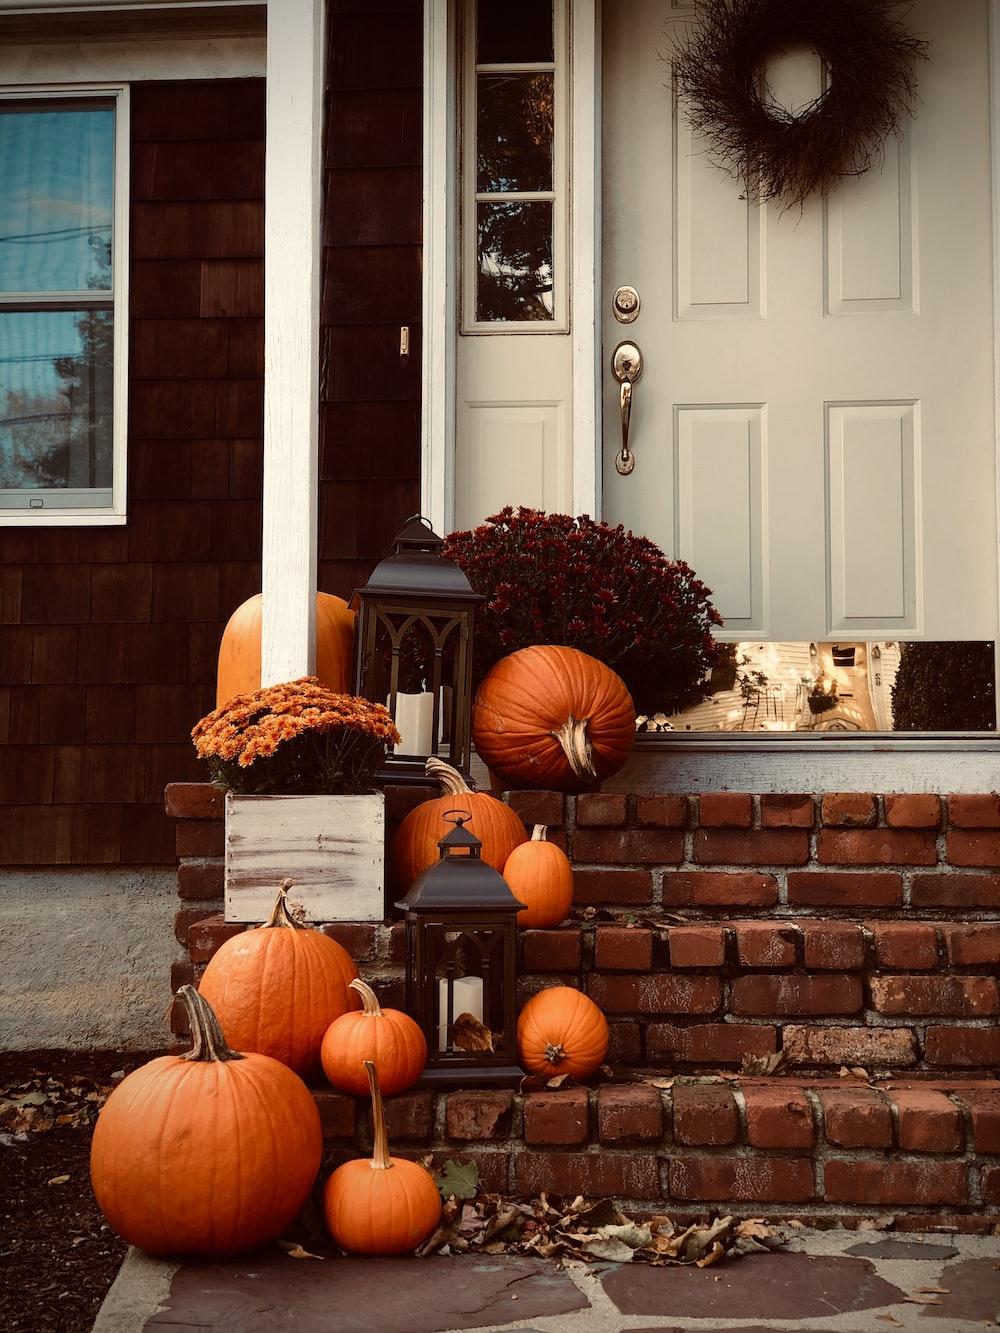 pumpkins on stairs